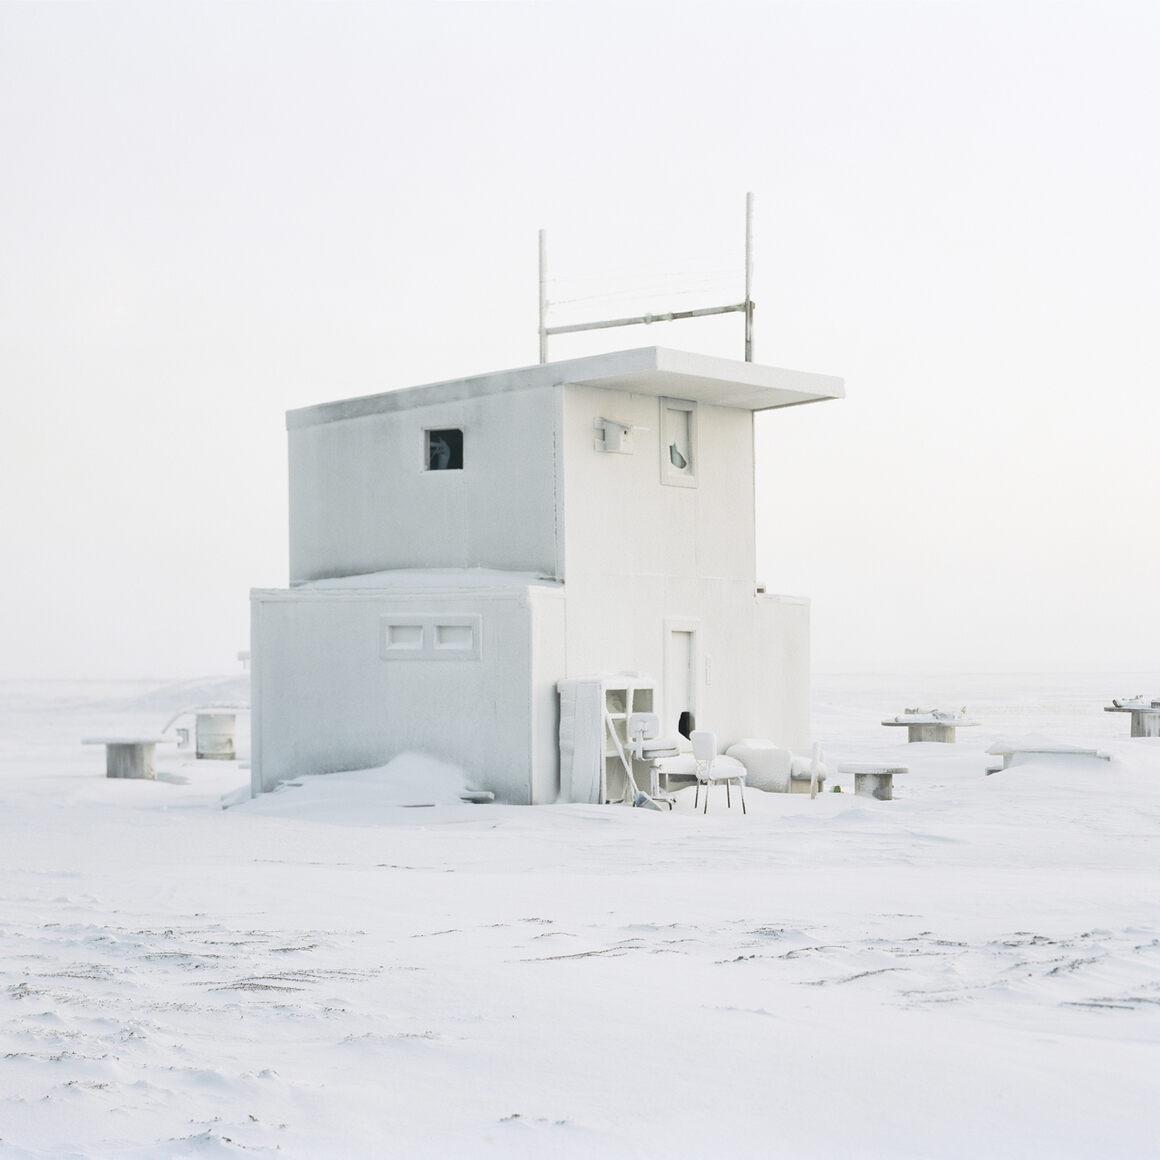 Barrow Cabin, Winter.